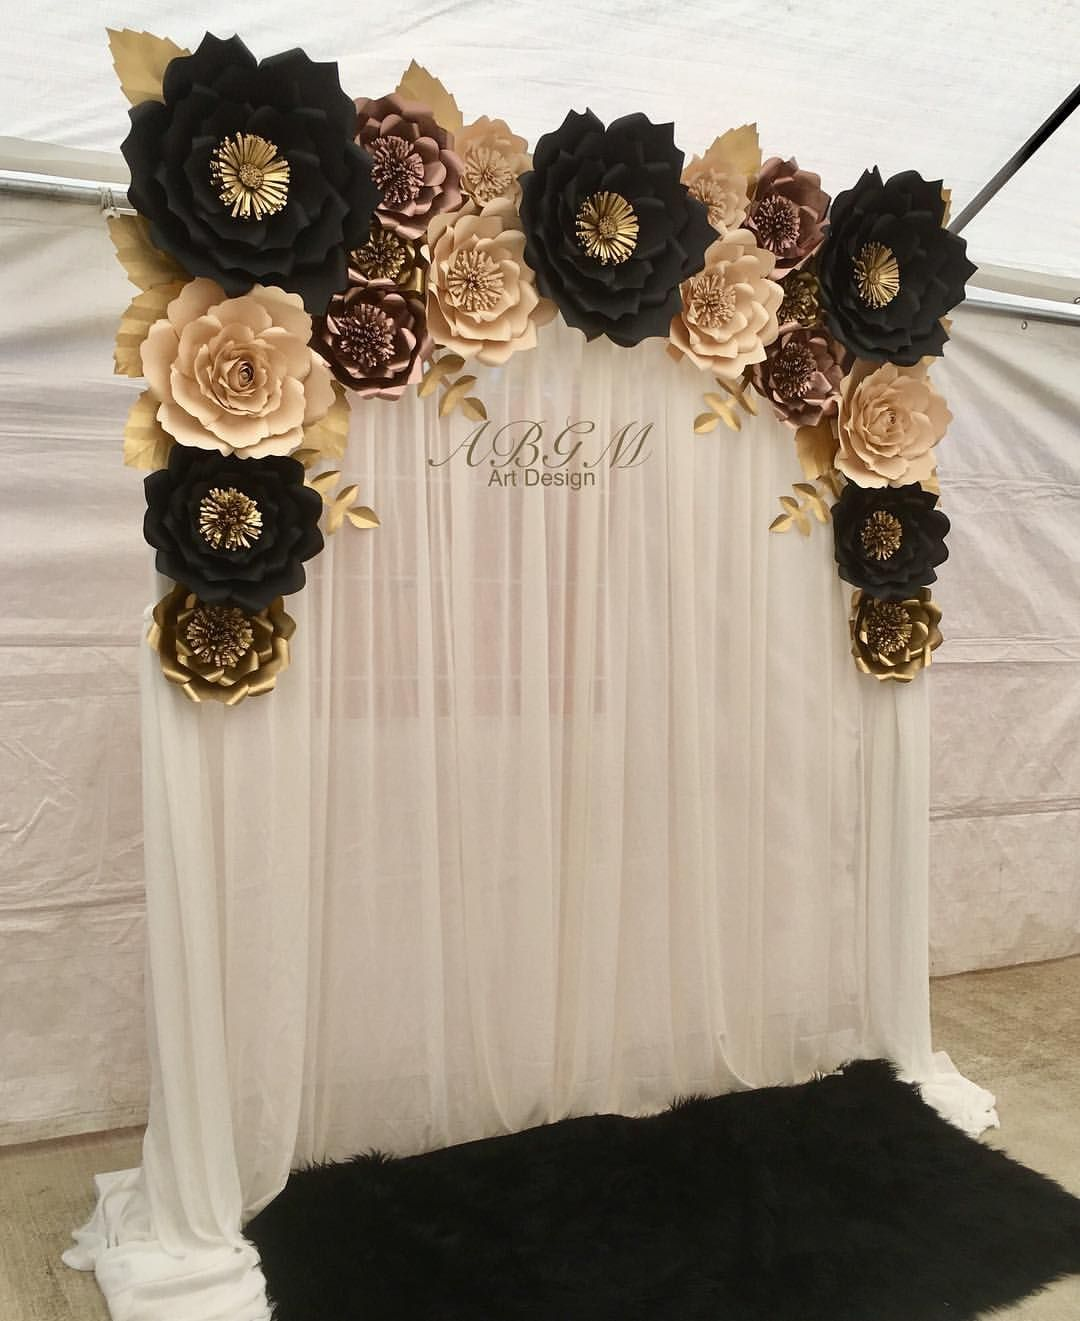 Flower Backdrop In Colors Black Rose Gold Tan And Gold Party Partydecor Pa Black And Gold Party Decorations Rose Gold Party Decor Gold Party Decorations